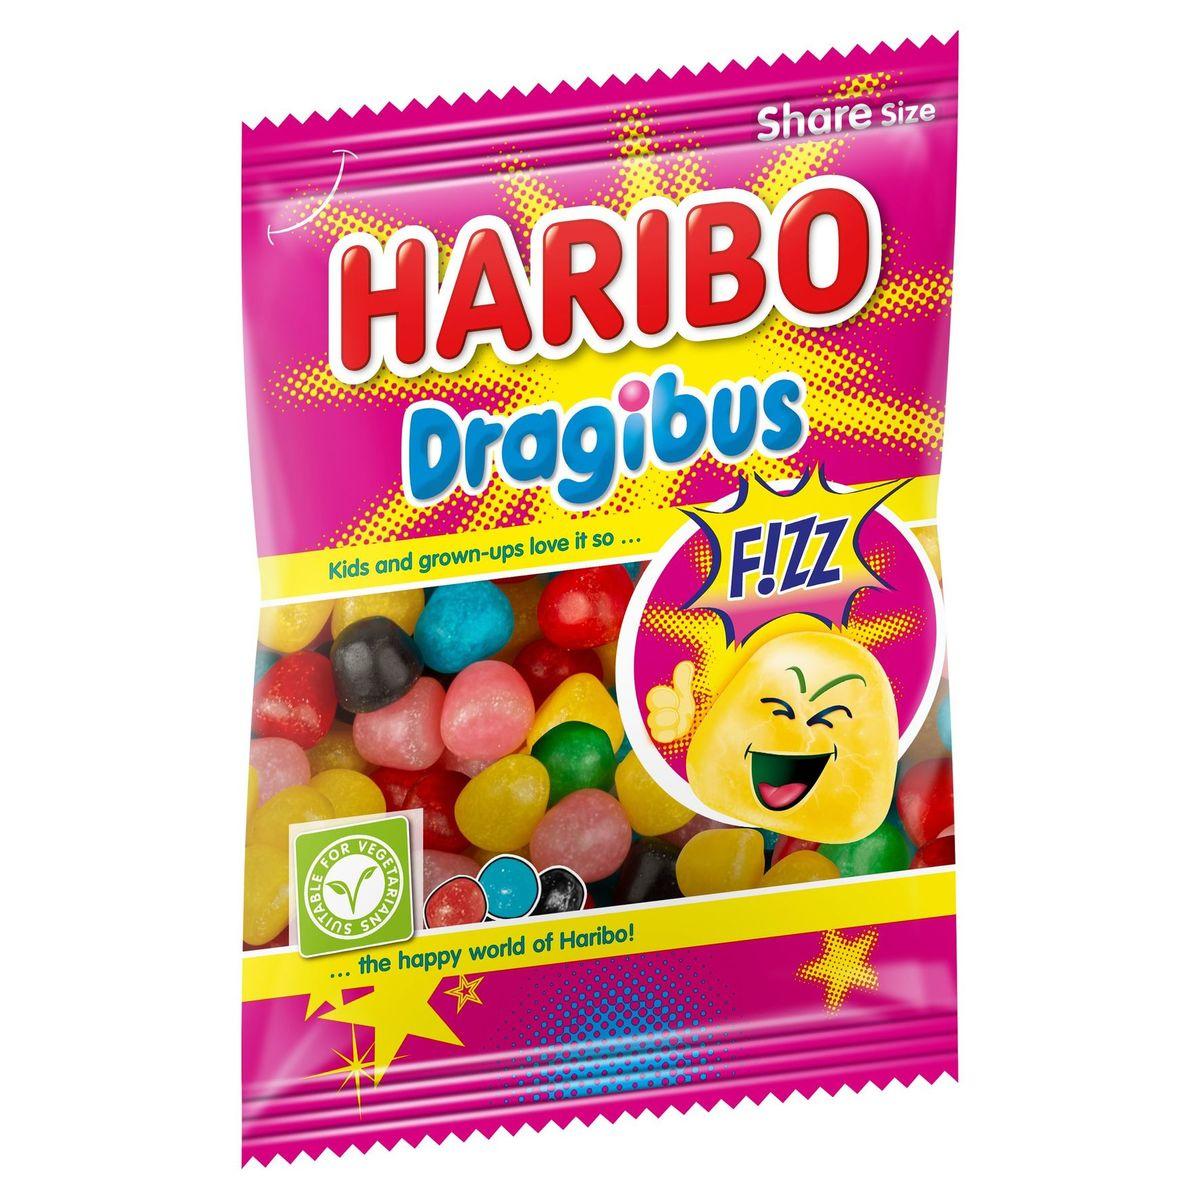 Haribo Dragibus F!ZZ Share Size 200 g